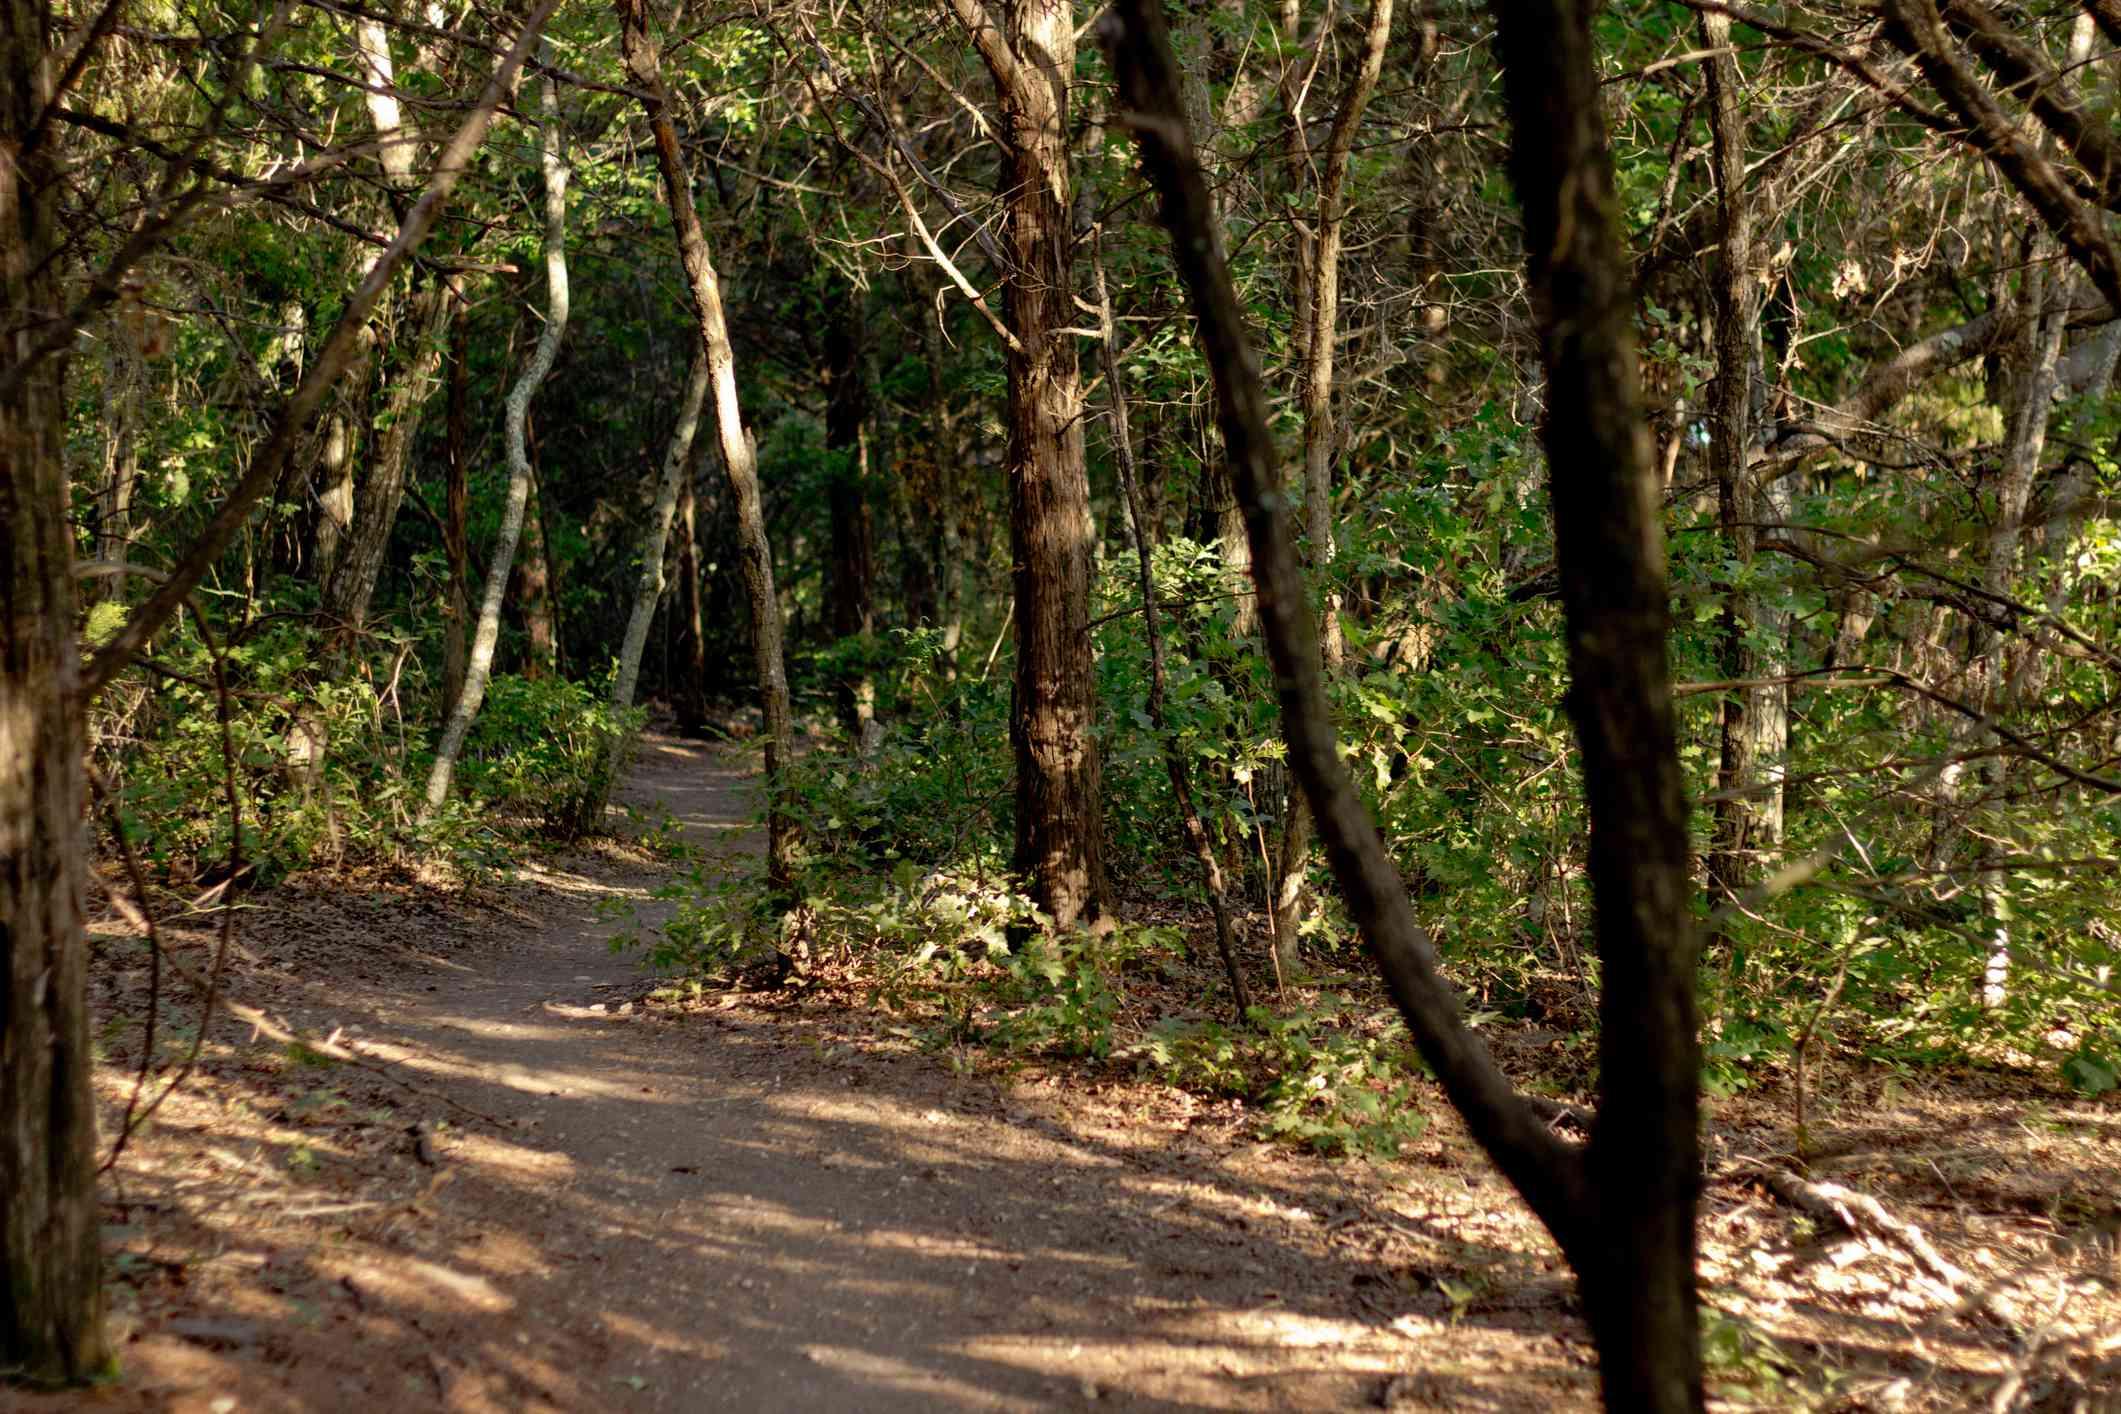 Footpath Amidst Trees At Cedar Ridge Preserve